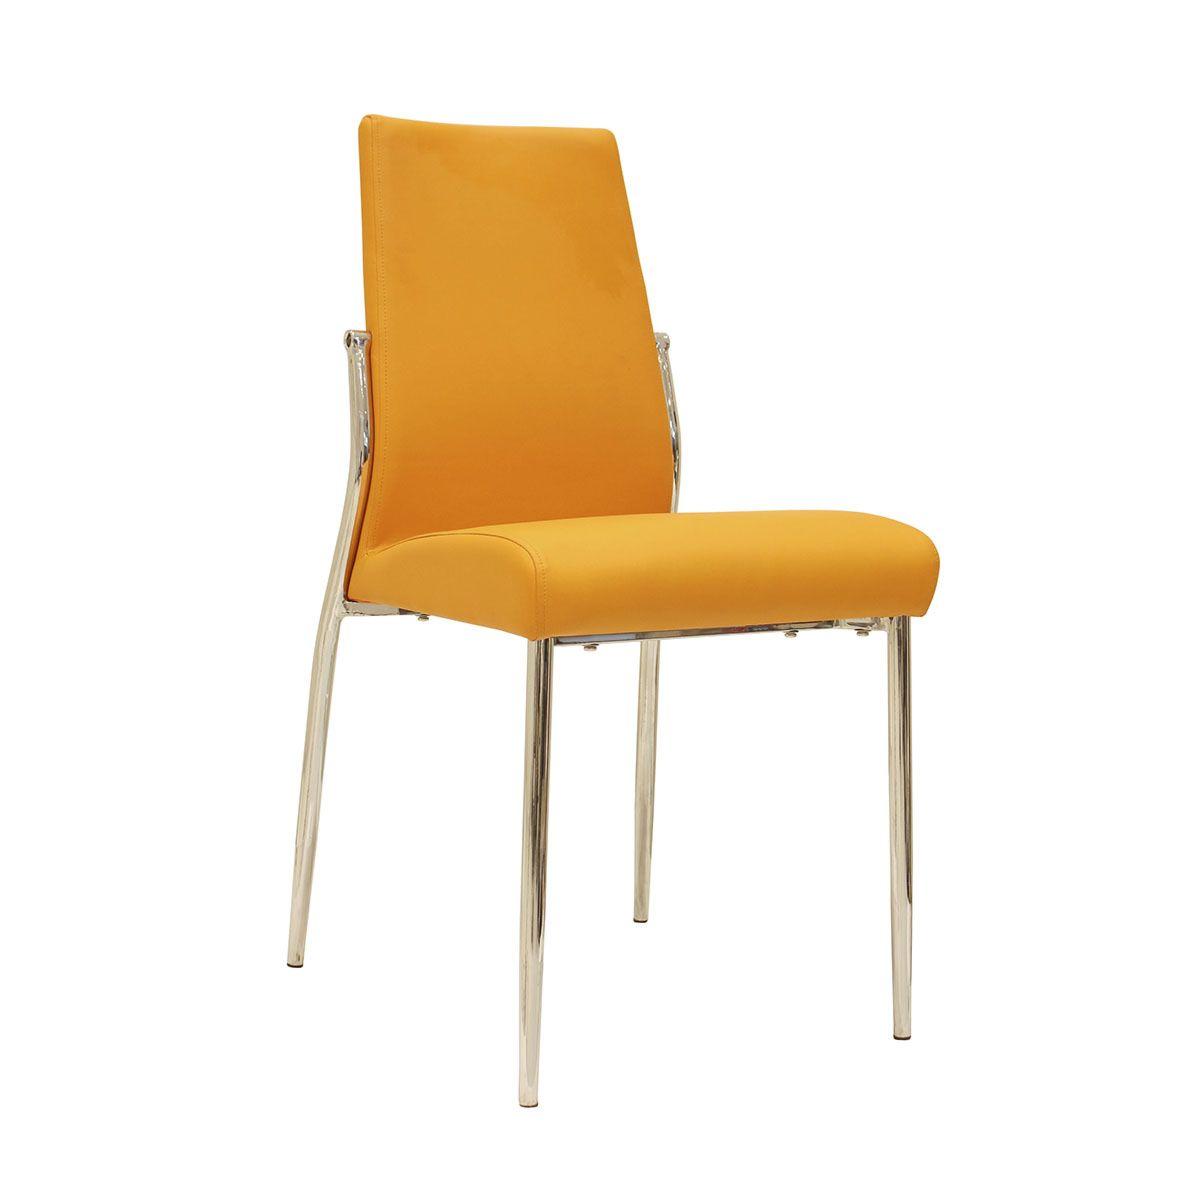 Set Of 4 Renzo Faux Leather Chairs - Chrome/Orange